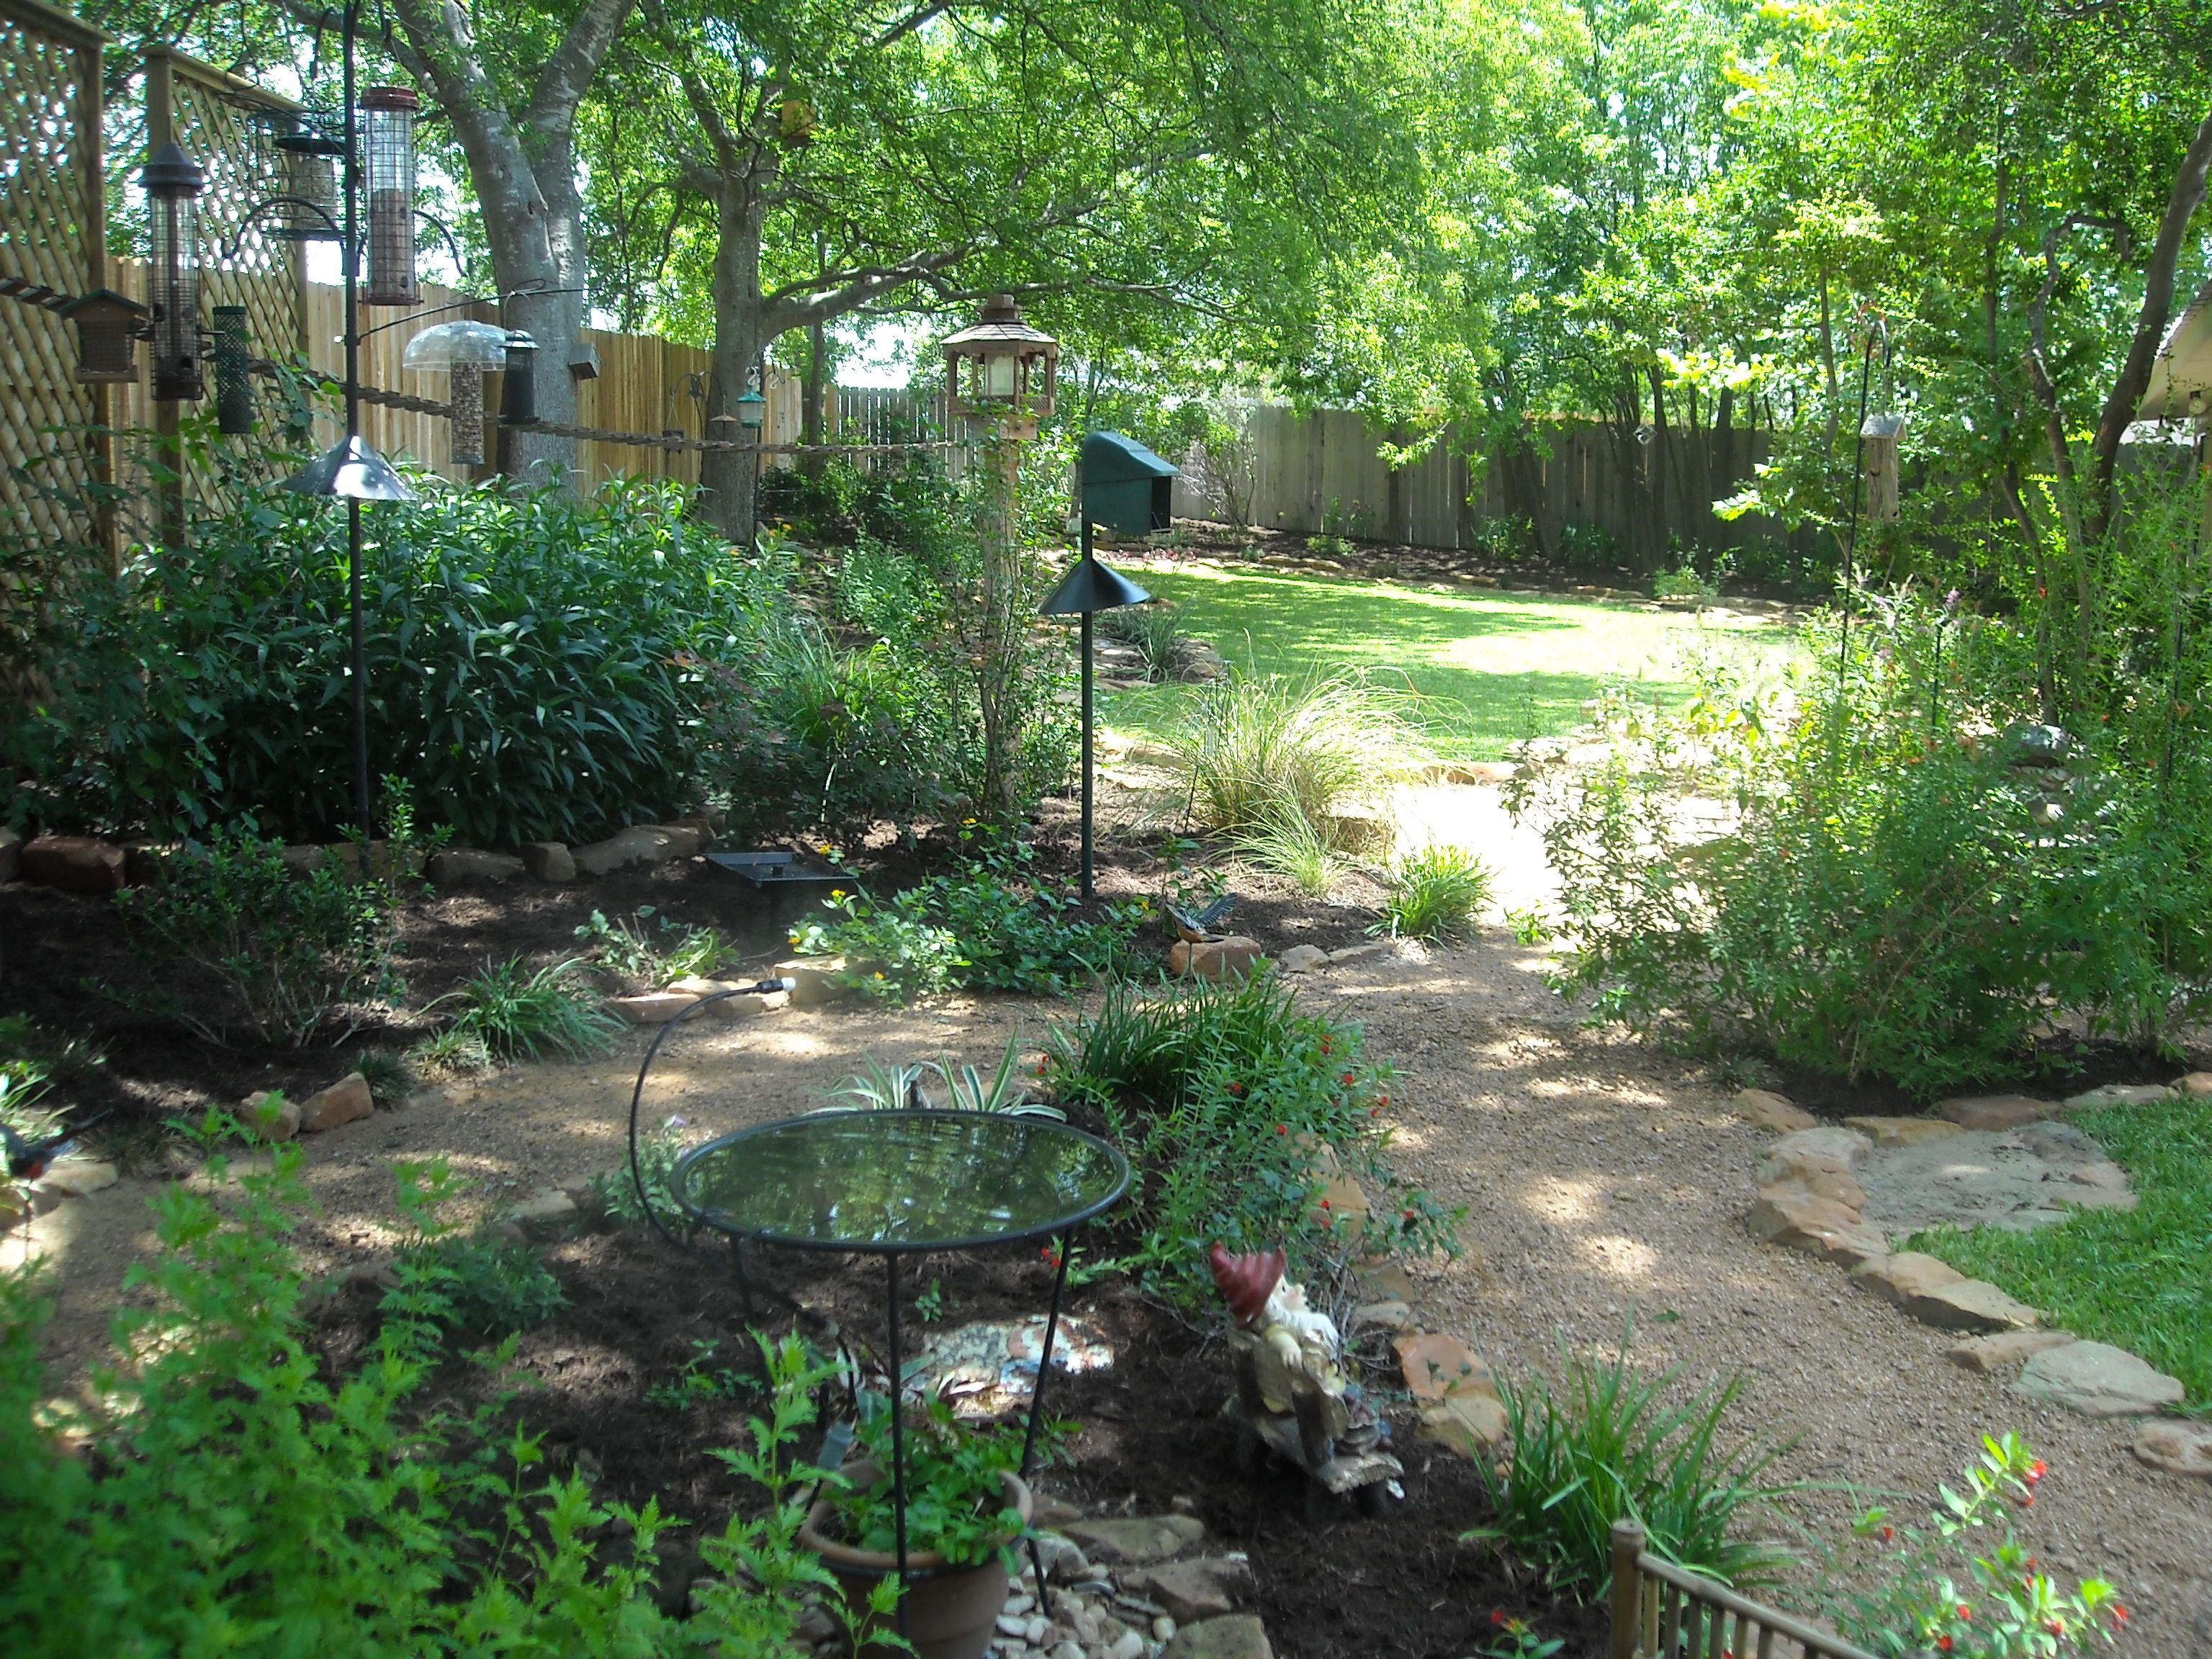 Backyard landscape - bird lover's paradise with walking ... on Birds Backyard Landscapes id=54597